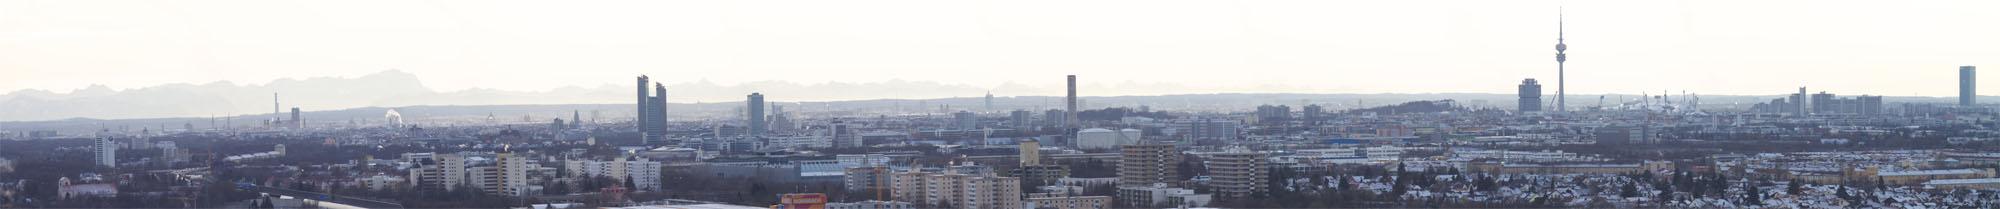 München im Panoramablick 2010